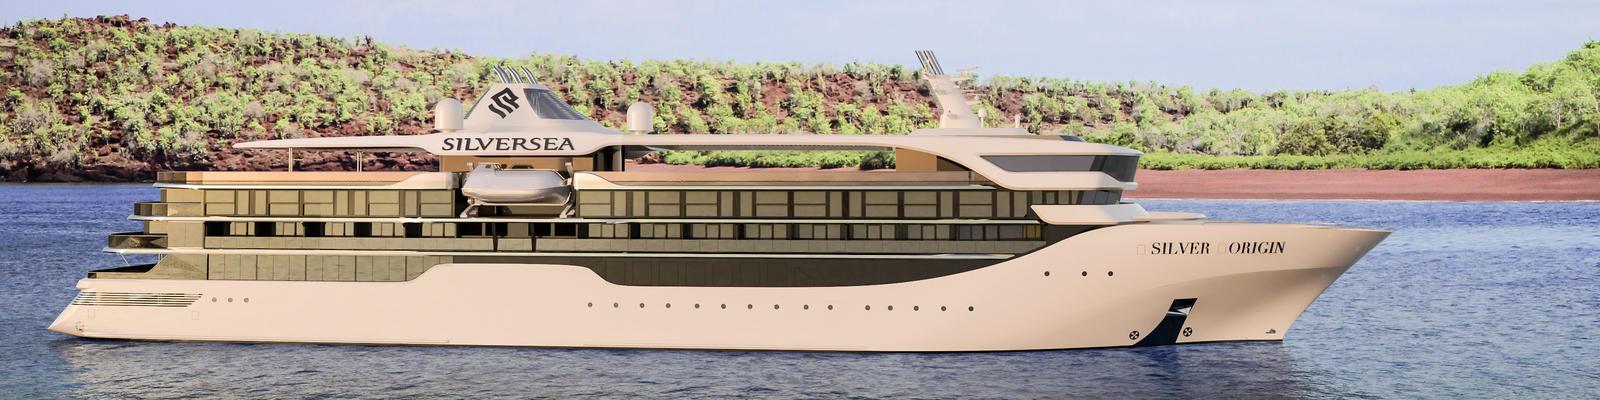 Artist rendering of Silverseas' forthcoming ship Silver Origin (Image: Silversea Cruises)